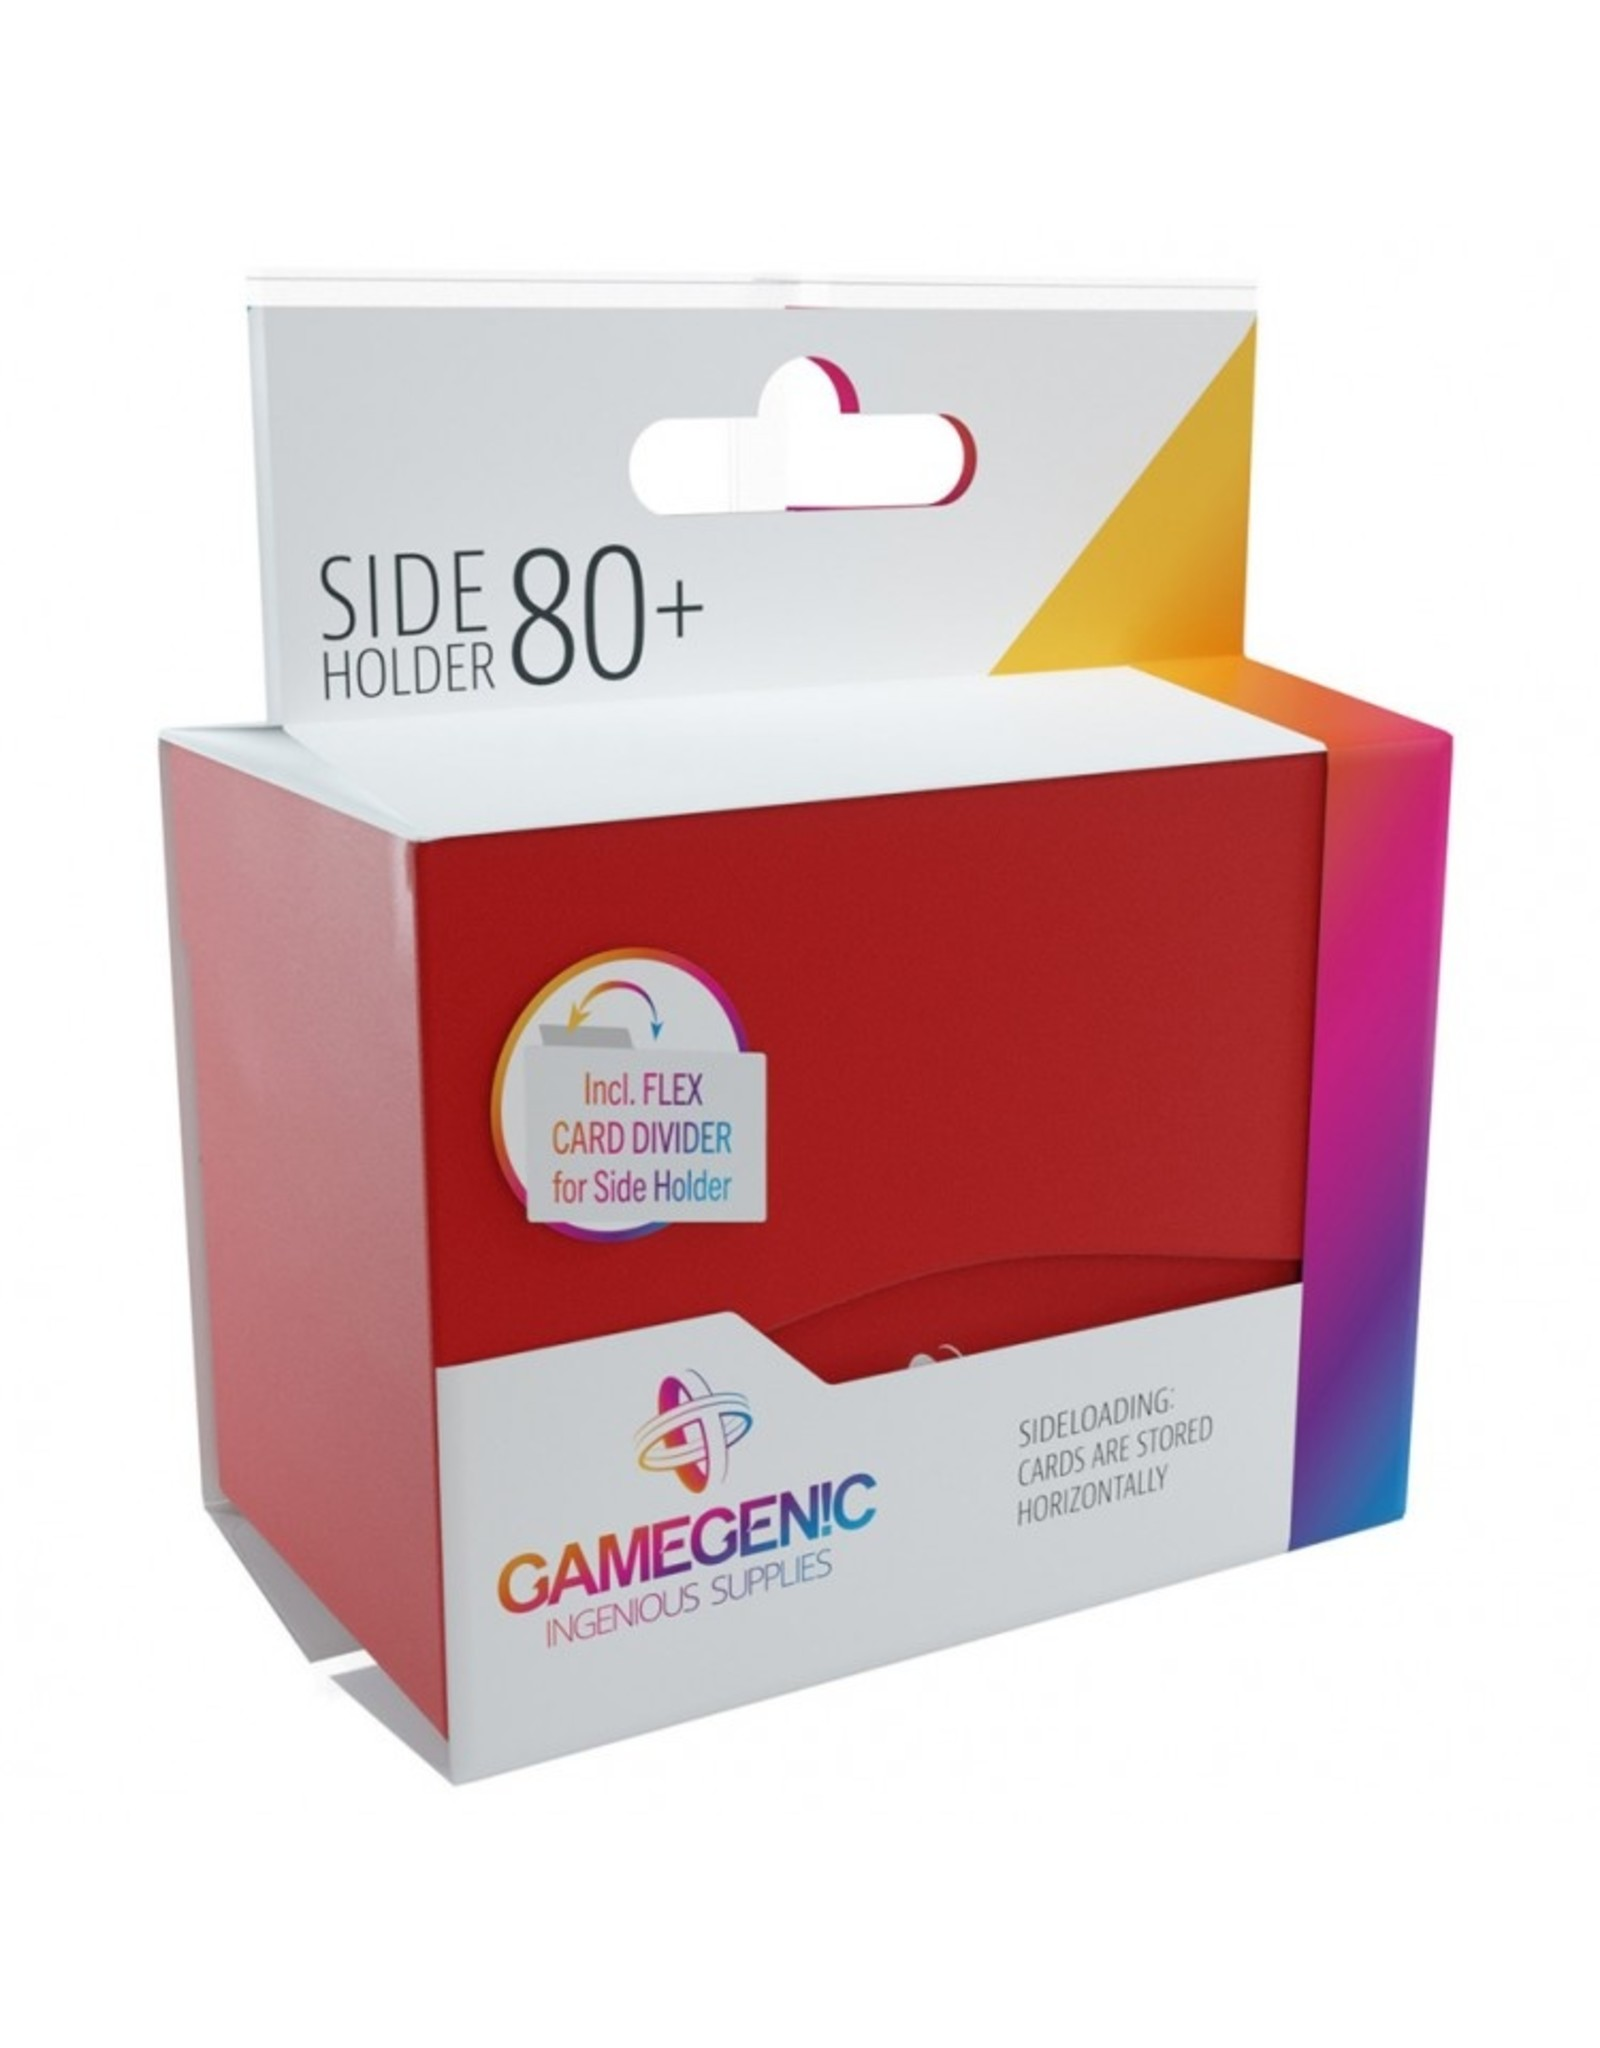 GameGenic Deck Box: Side Holder 80+ RD